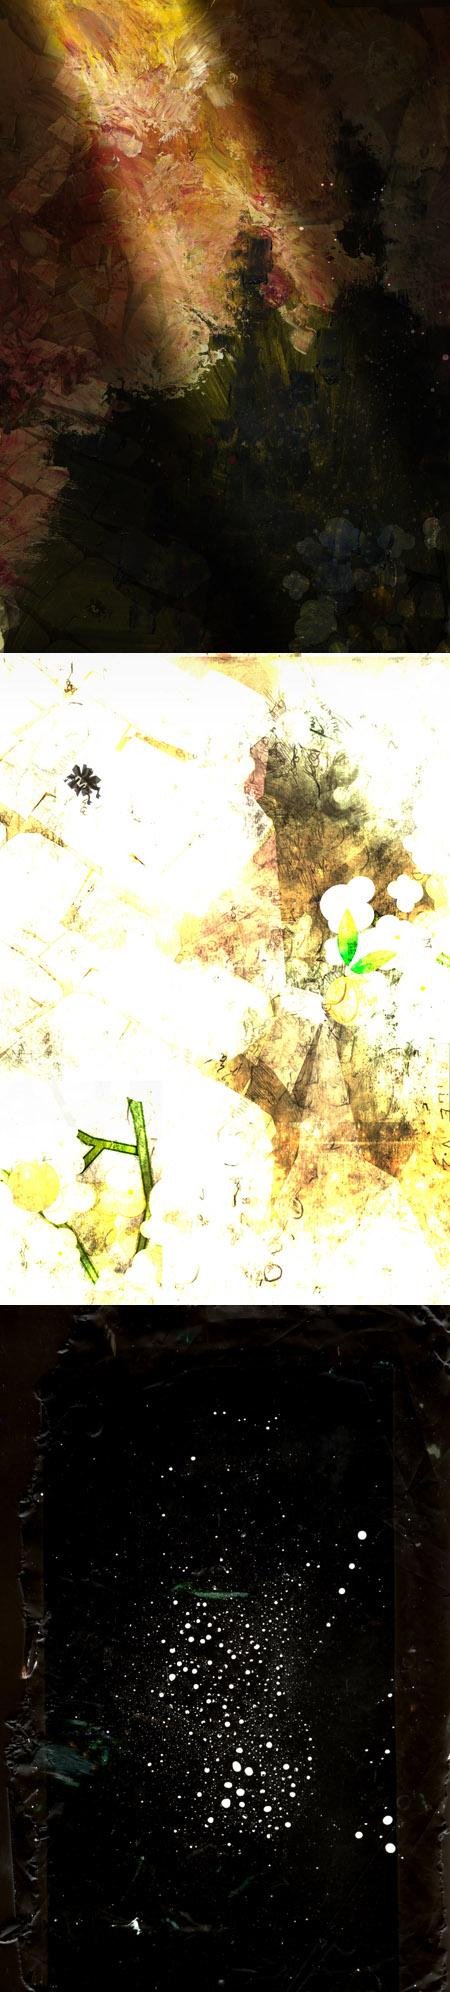 texturesdathuras.jpg